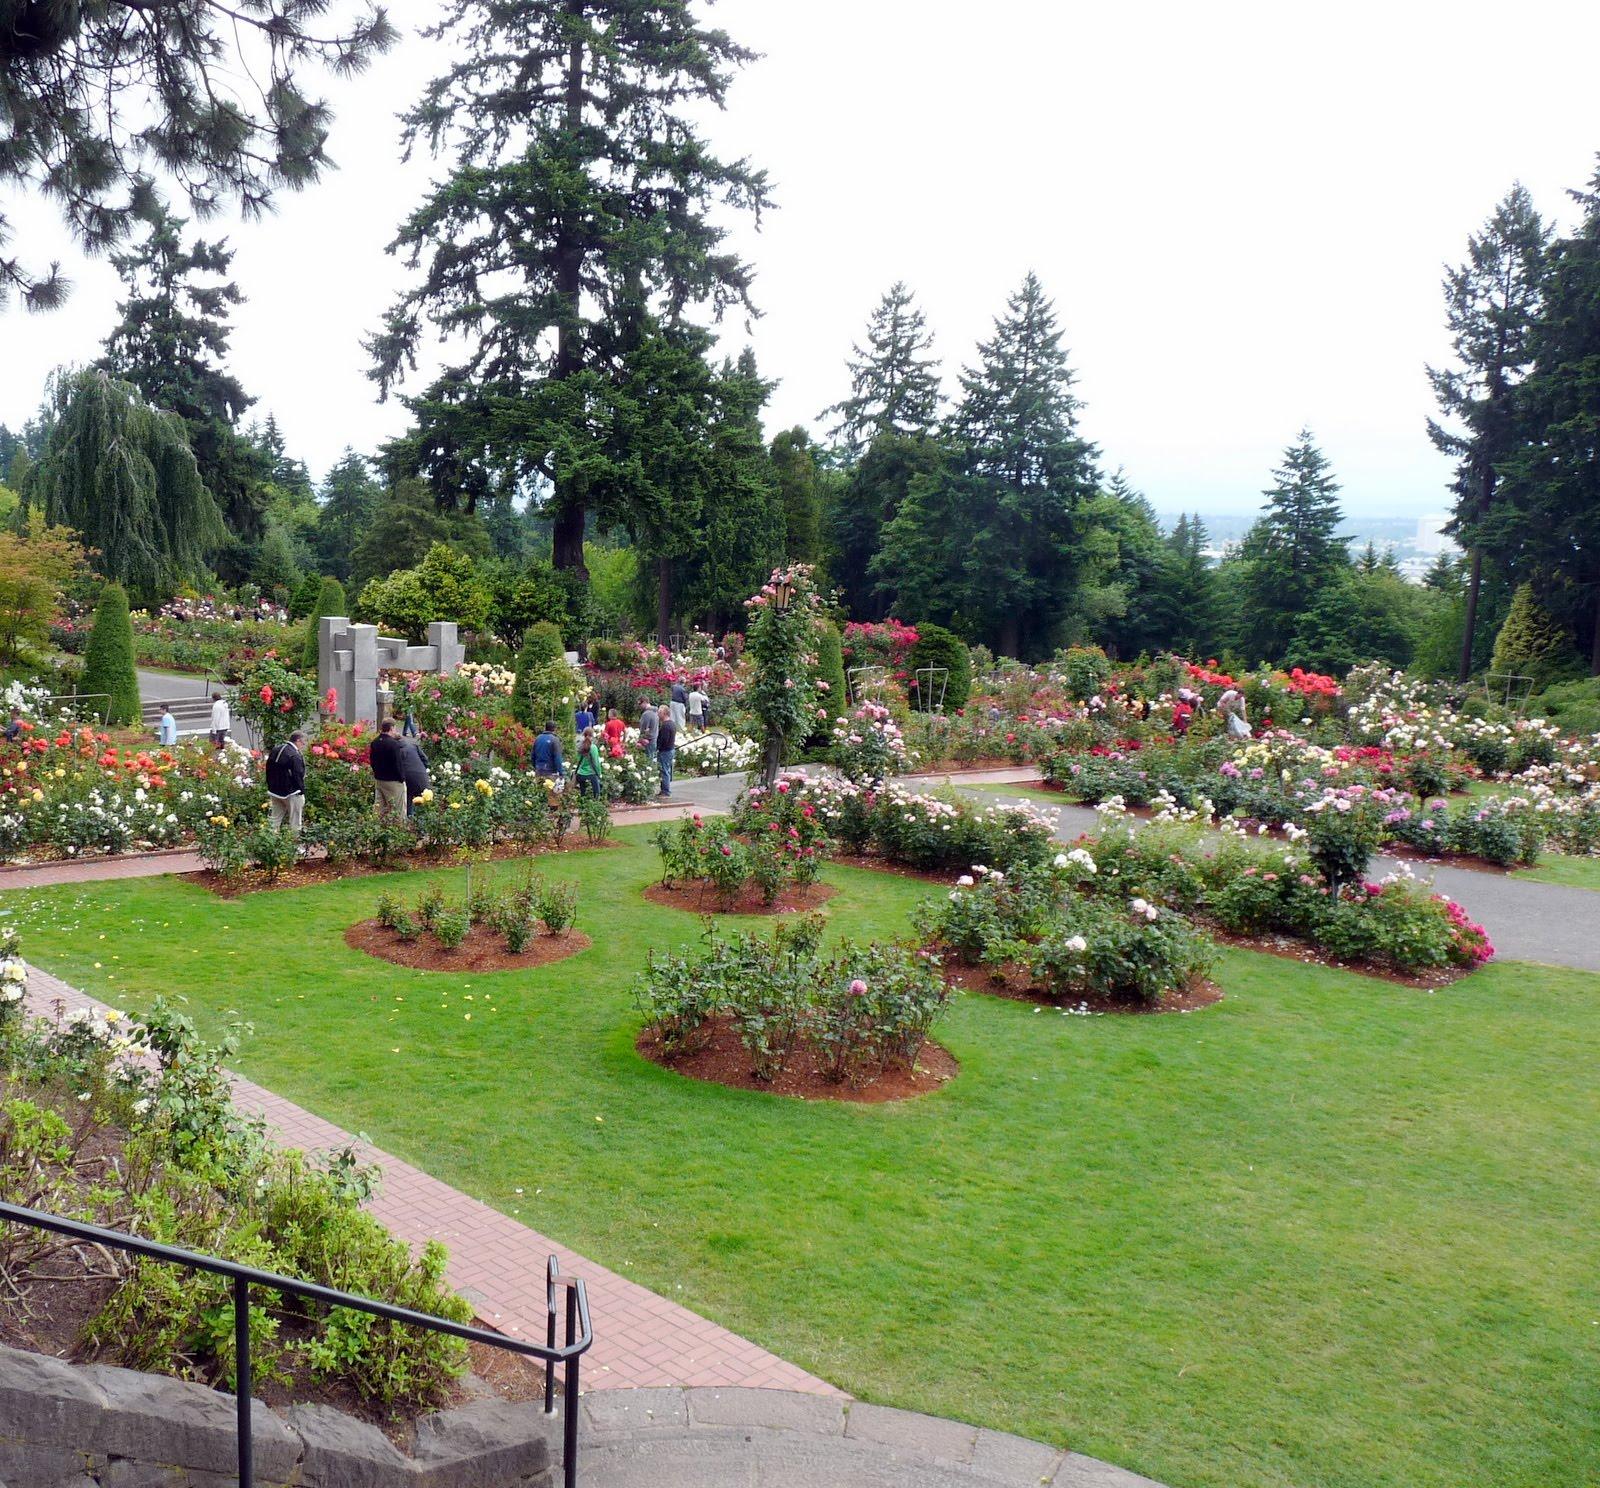 Portland S International Rose Test Gardens At Washington Park